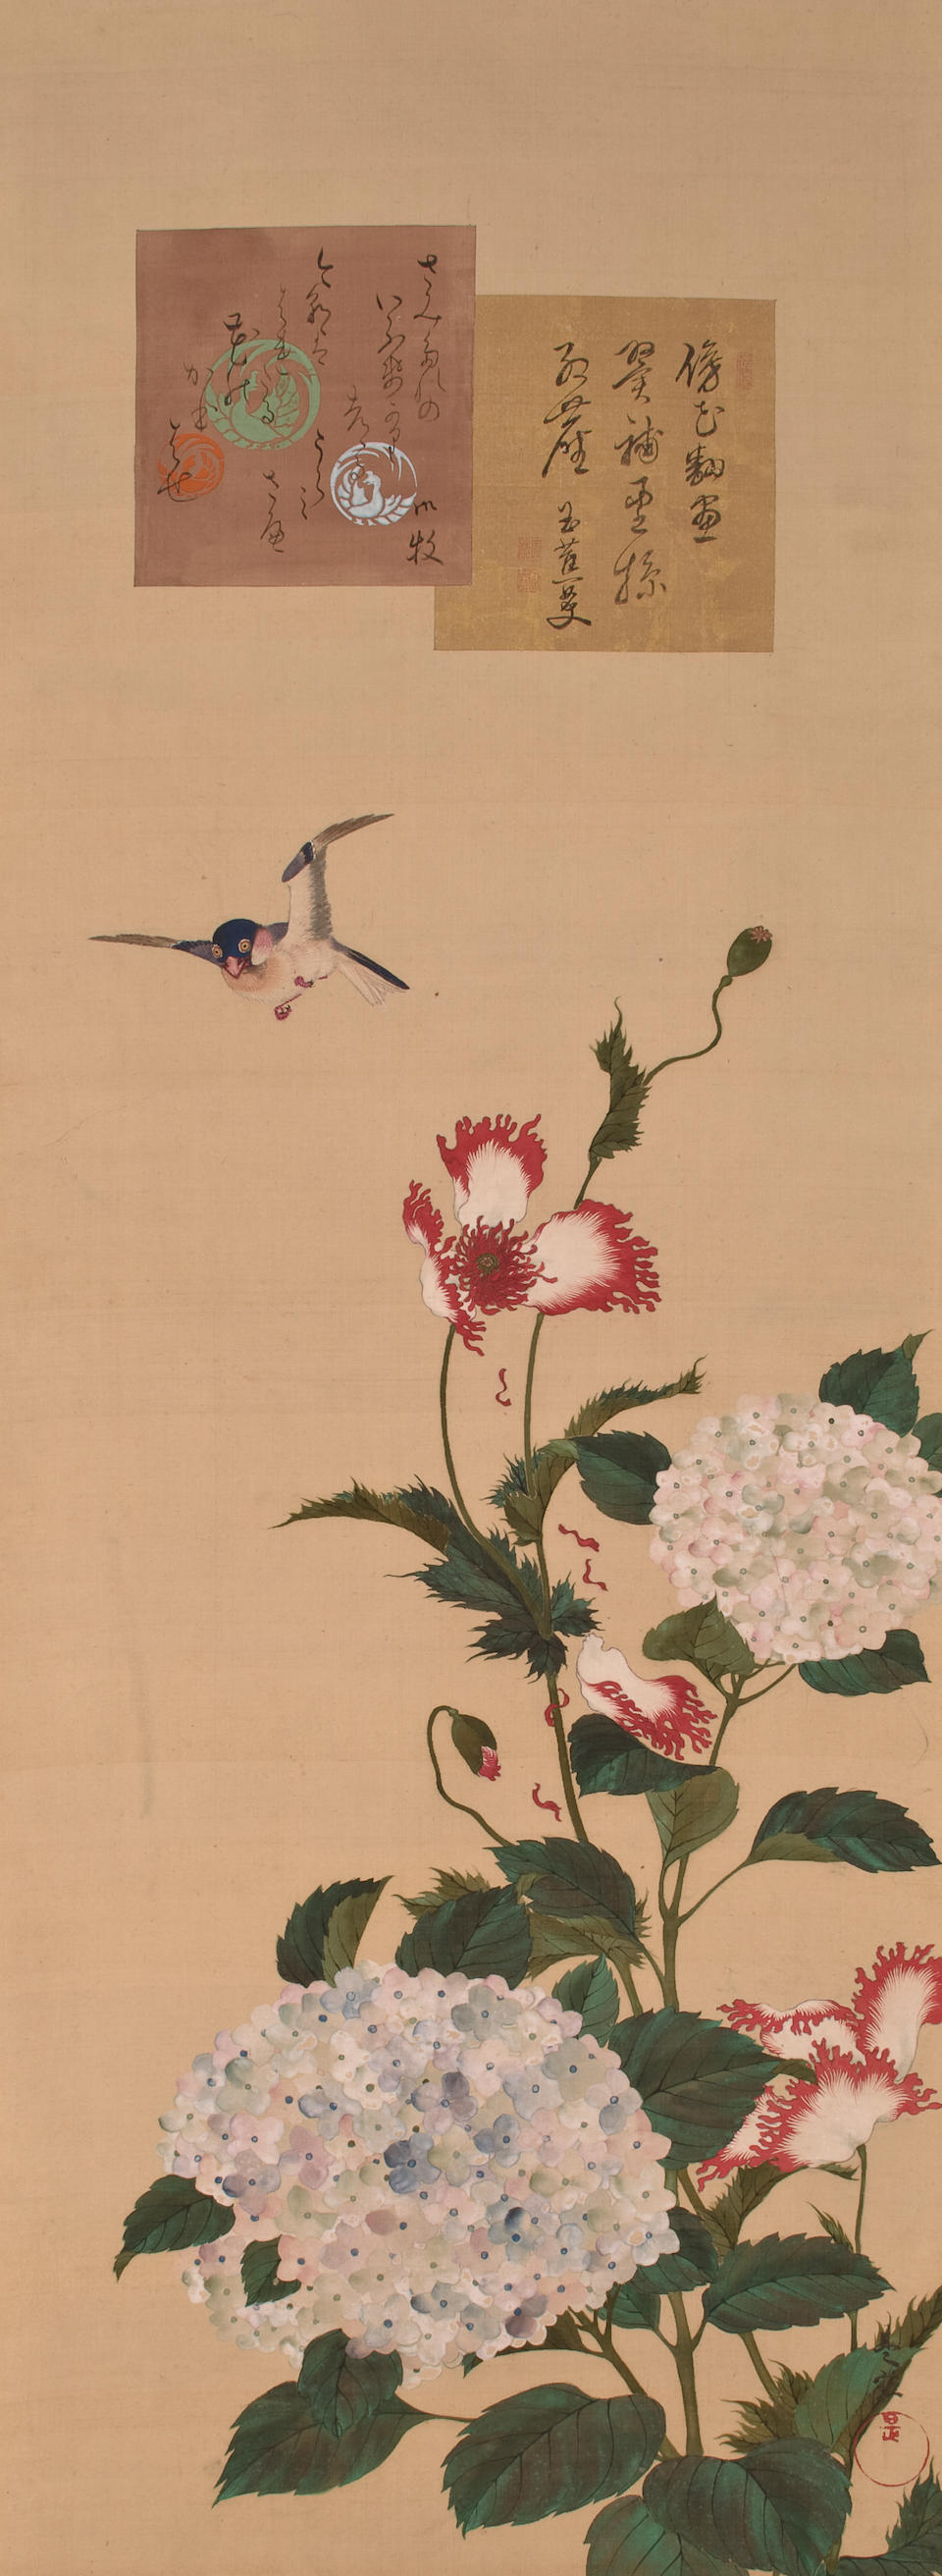 ZEKU, 19TH CENTURY Birds, animals and flowers of the twelve months